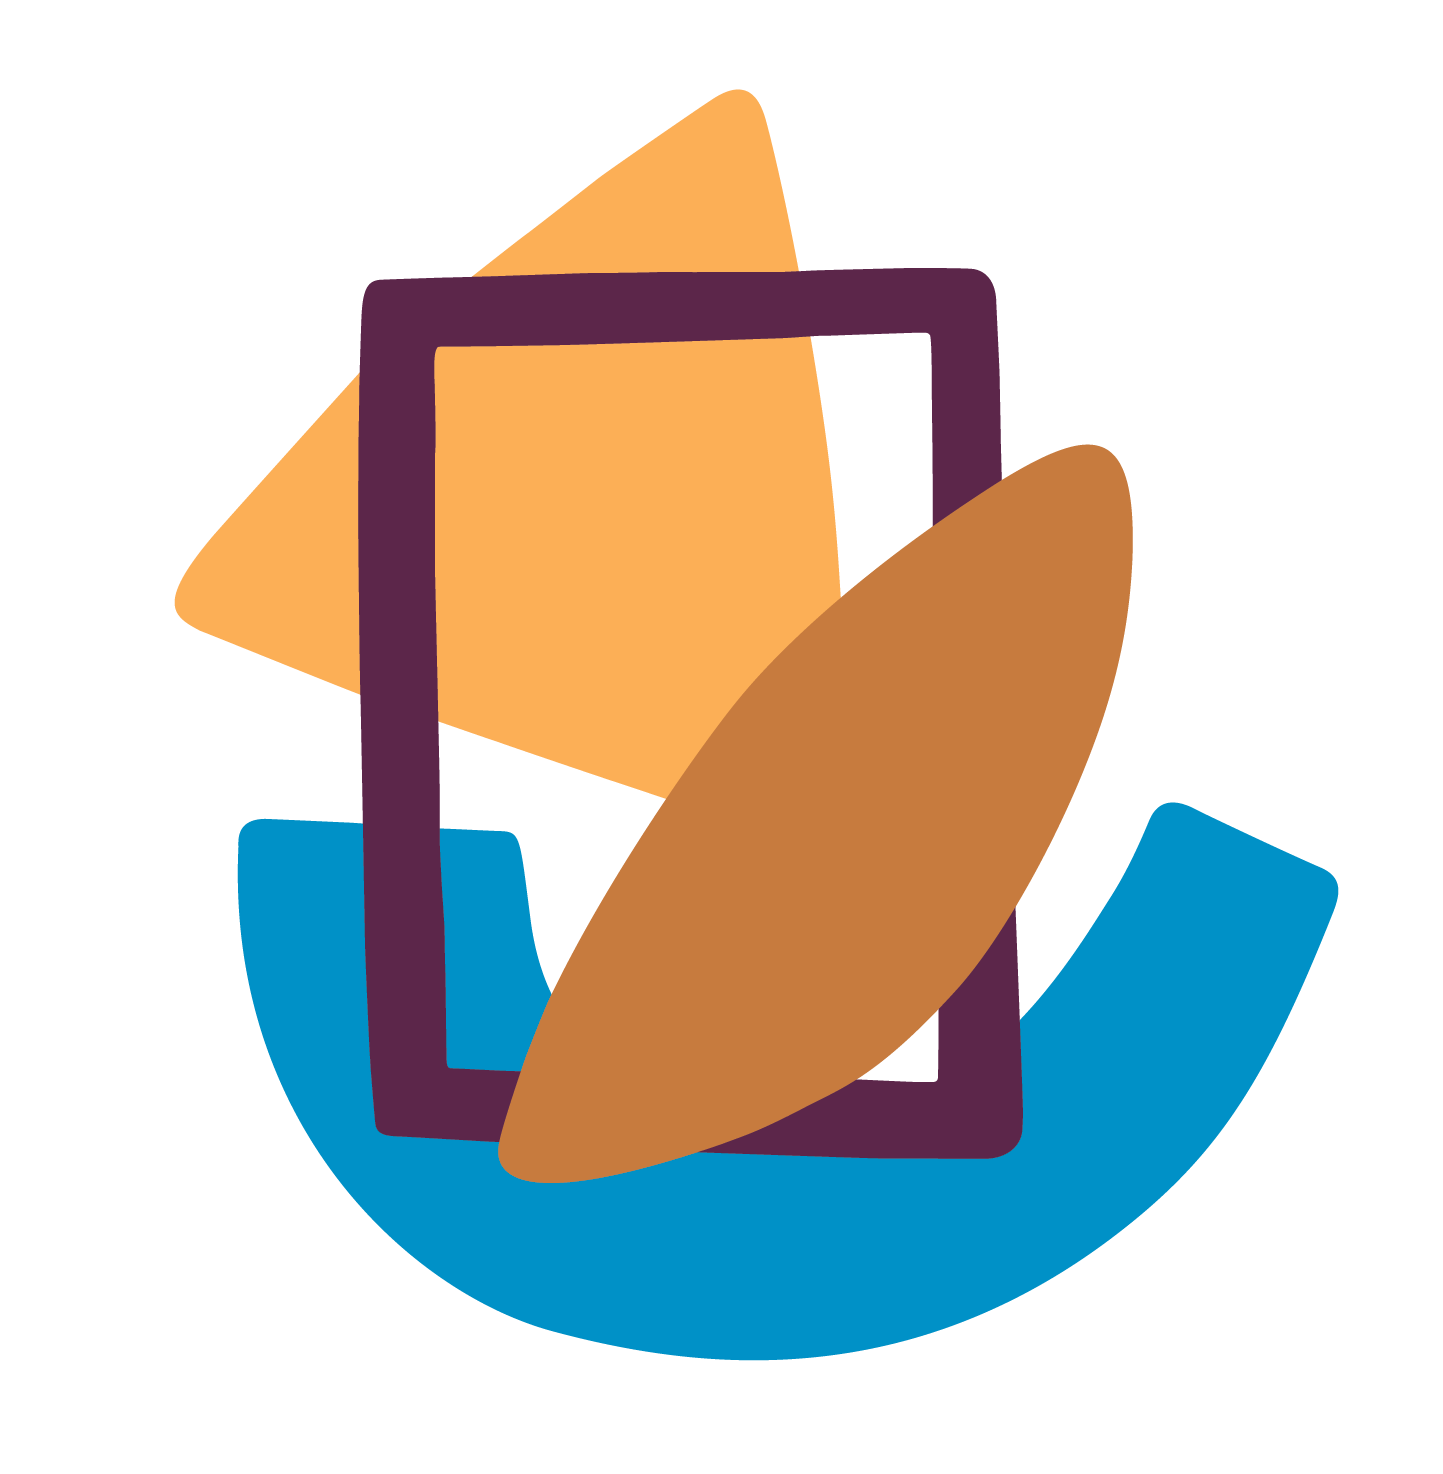 assets/images/custom/ctc/logo-min.png